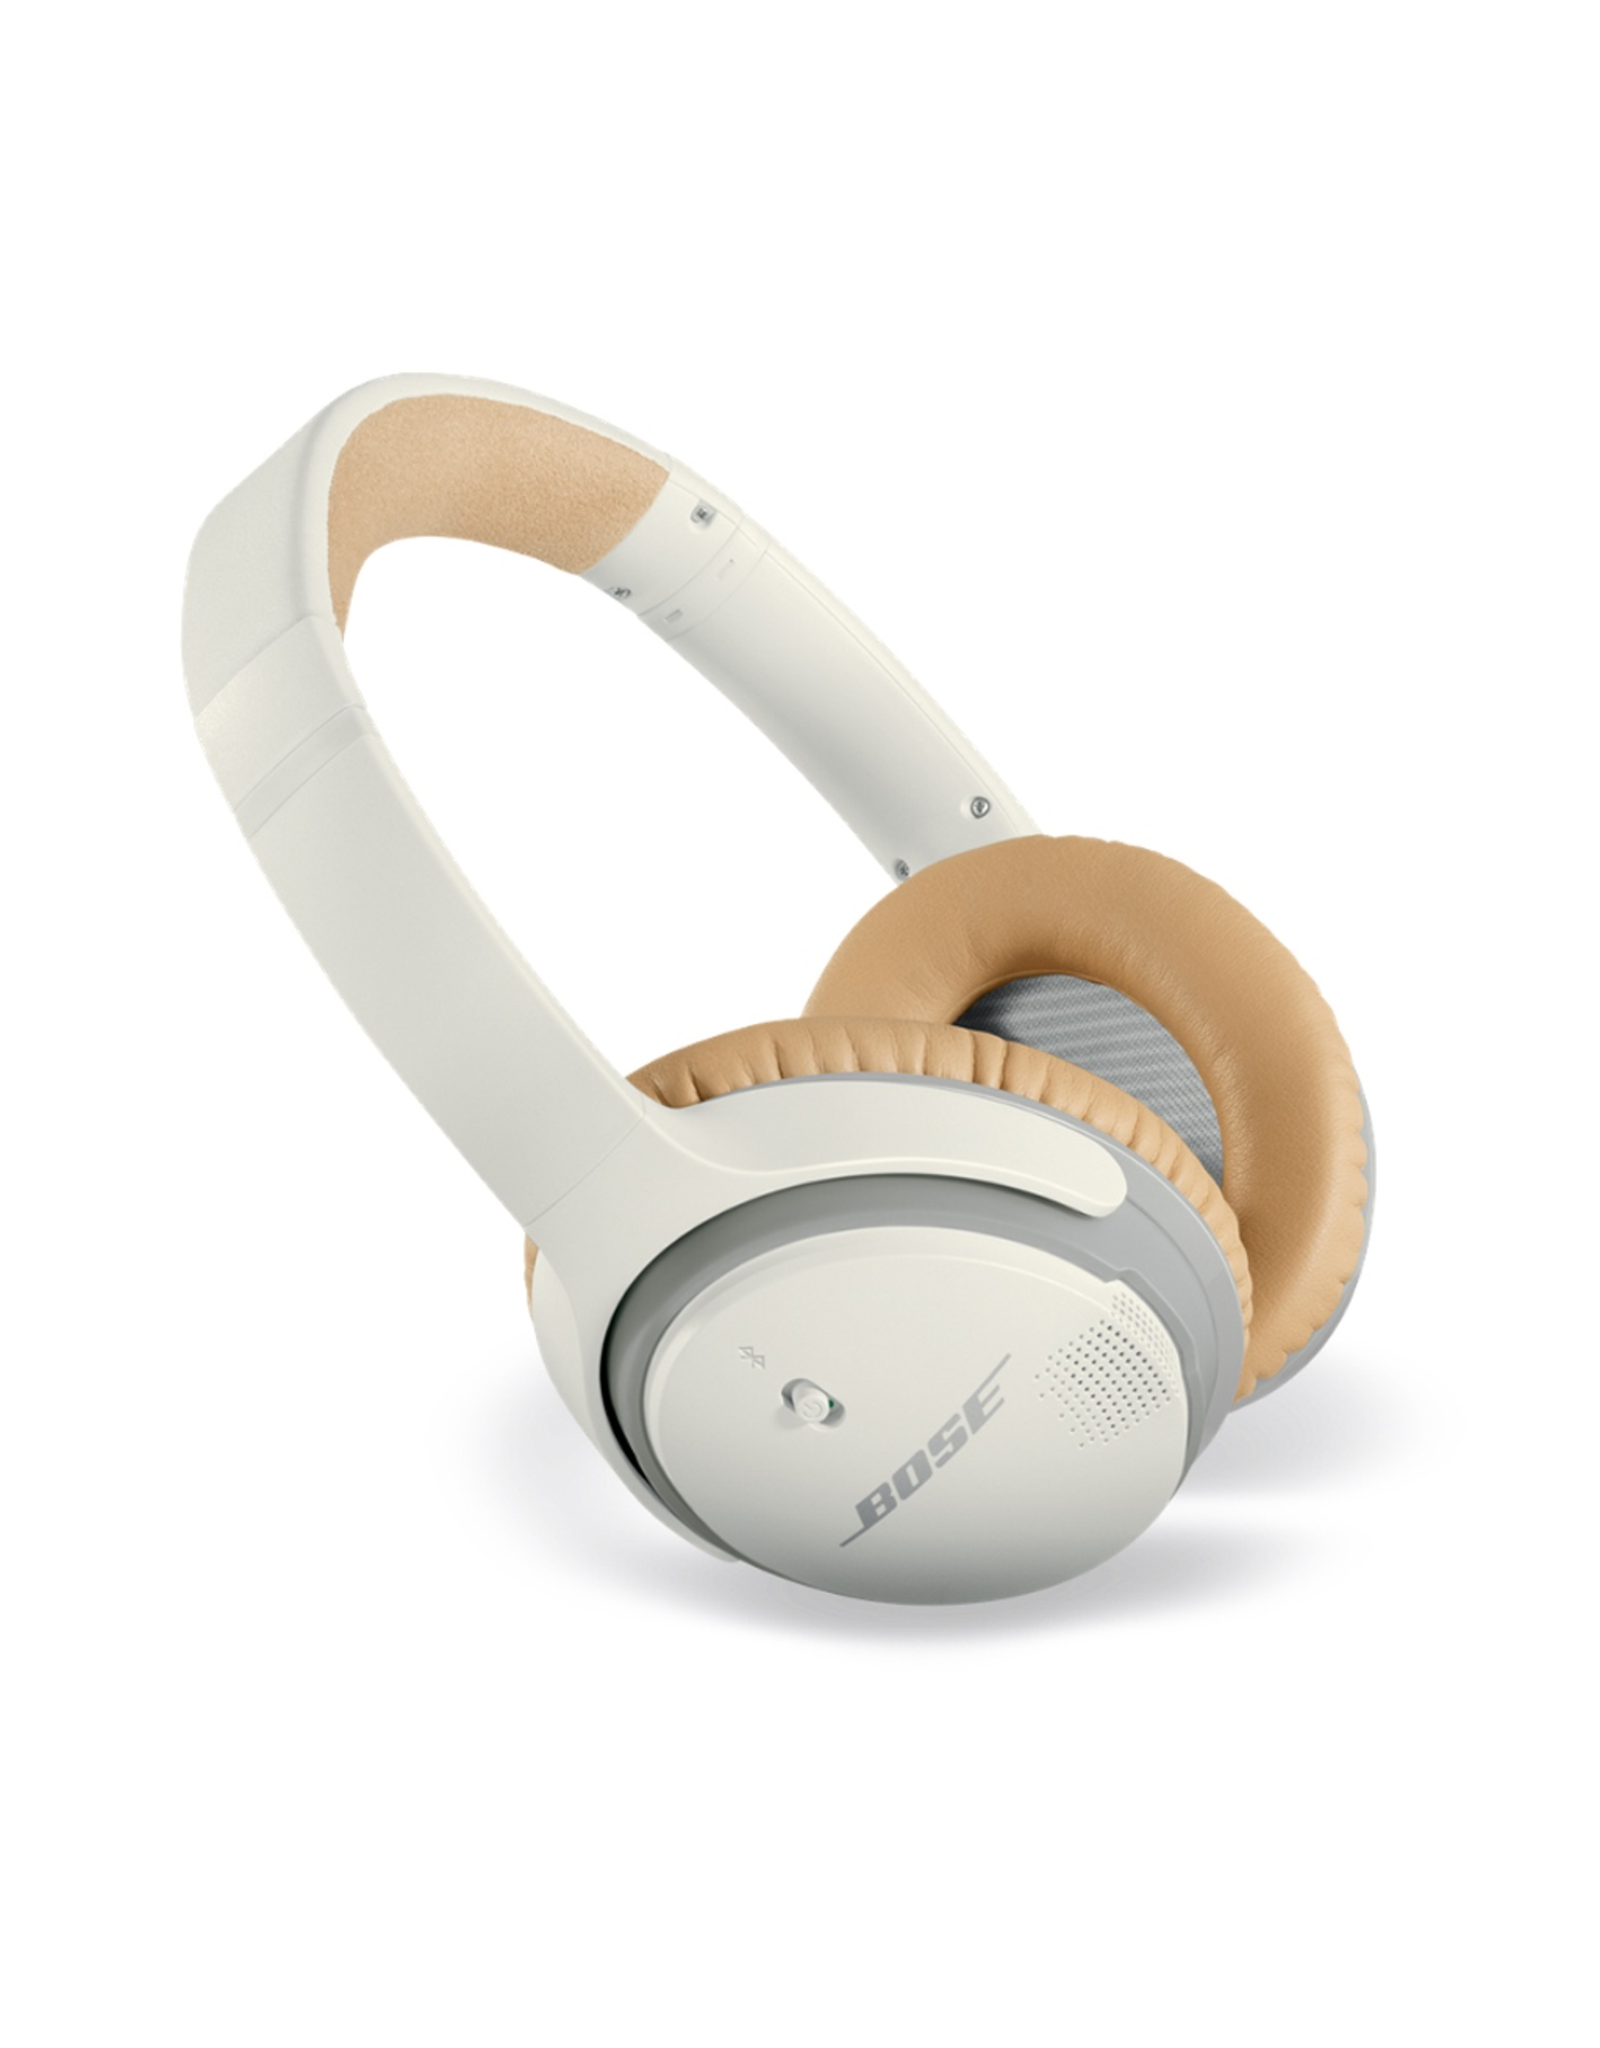 BOSE BOSE Soundlink Around- Ear S2 Wireless Headphones